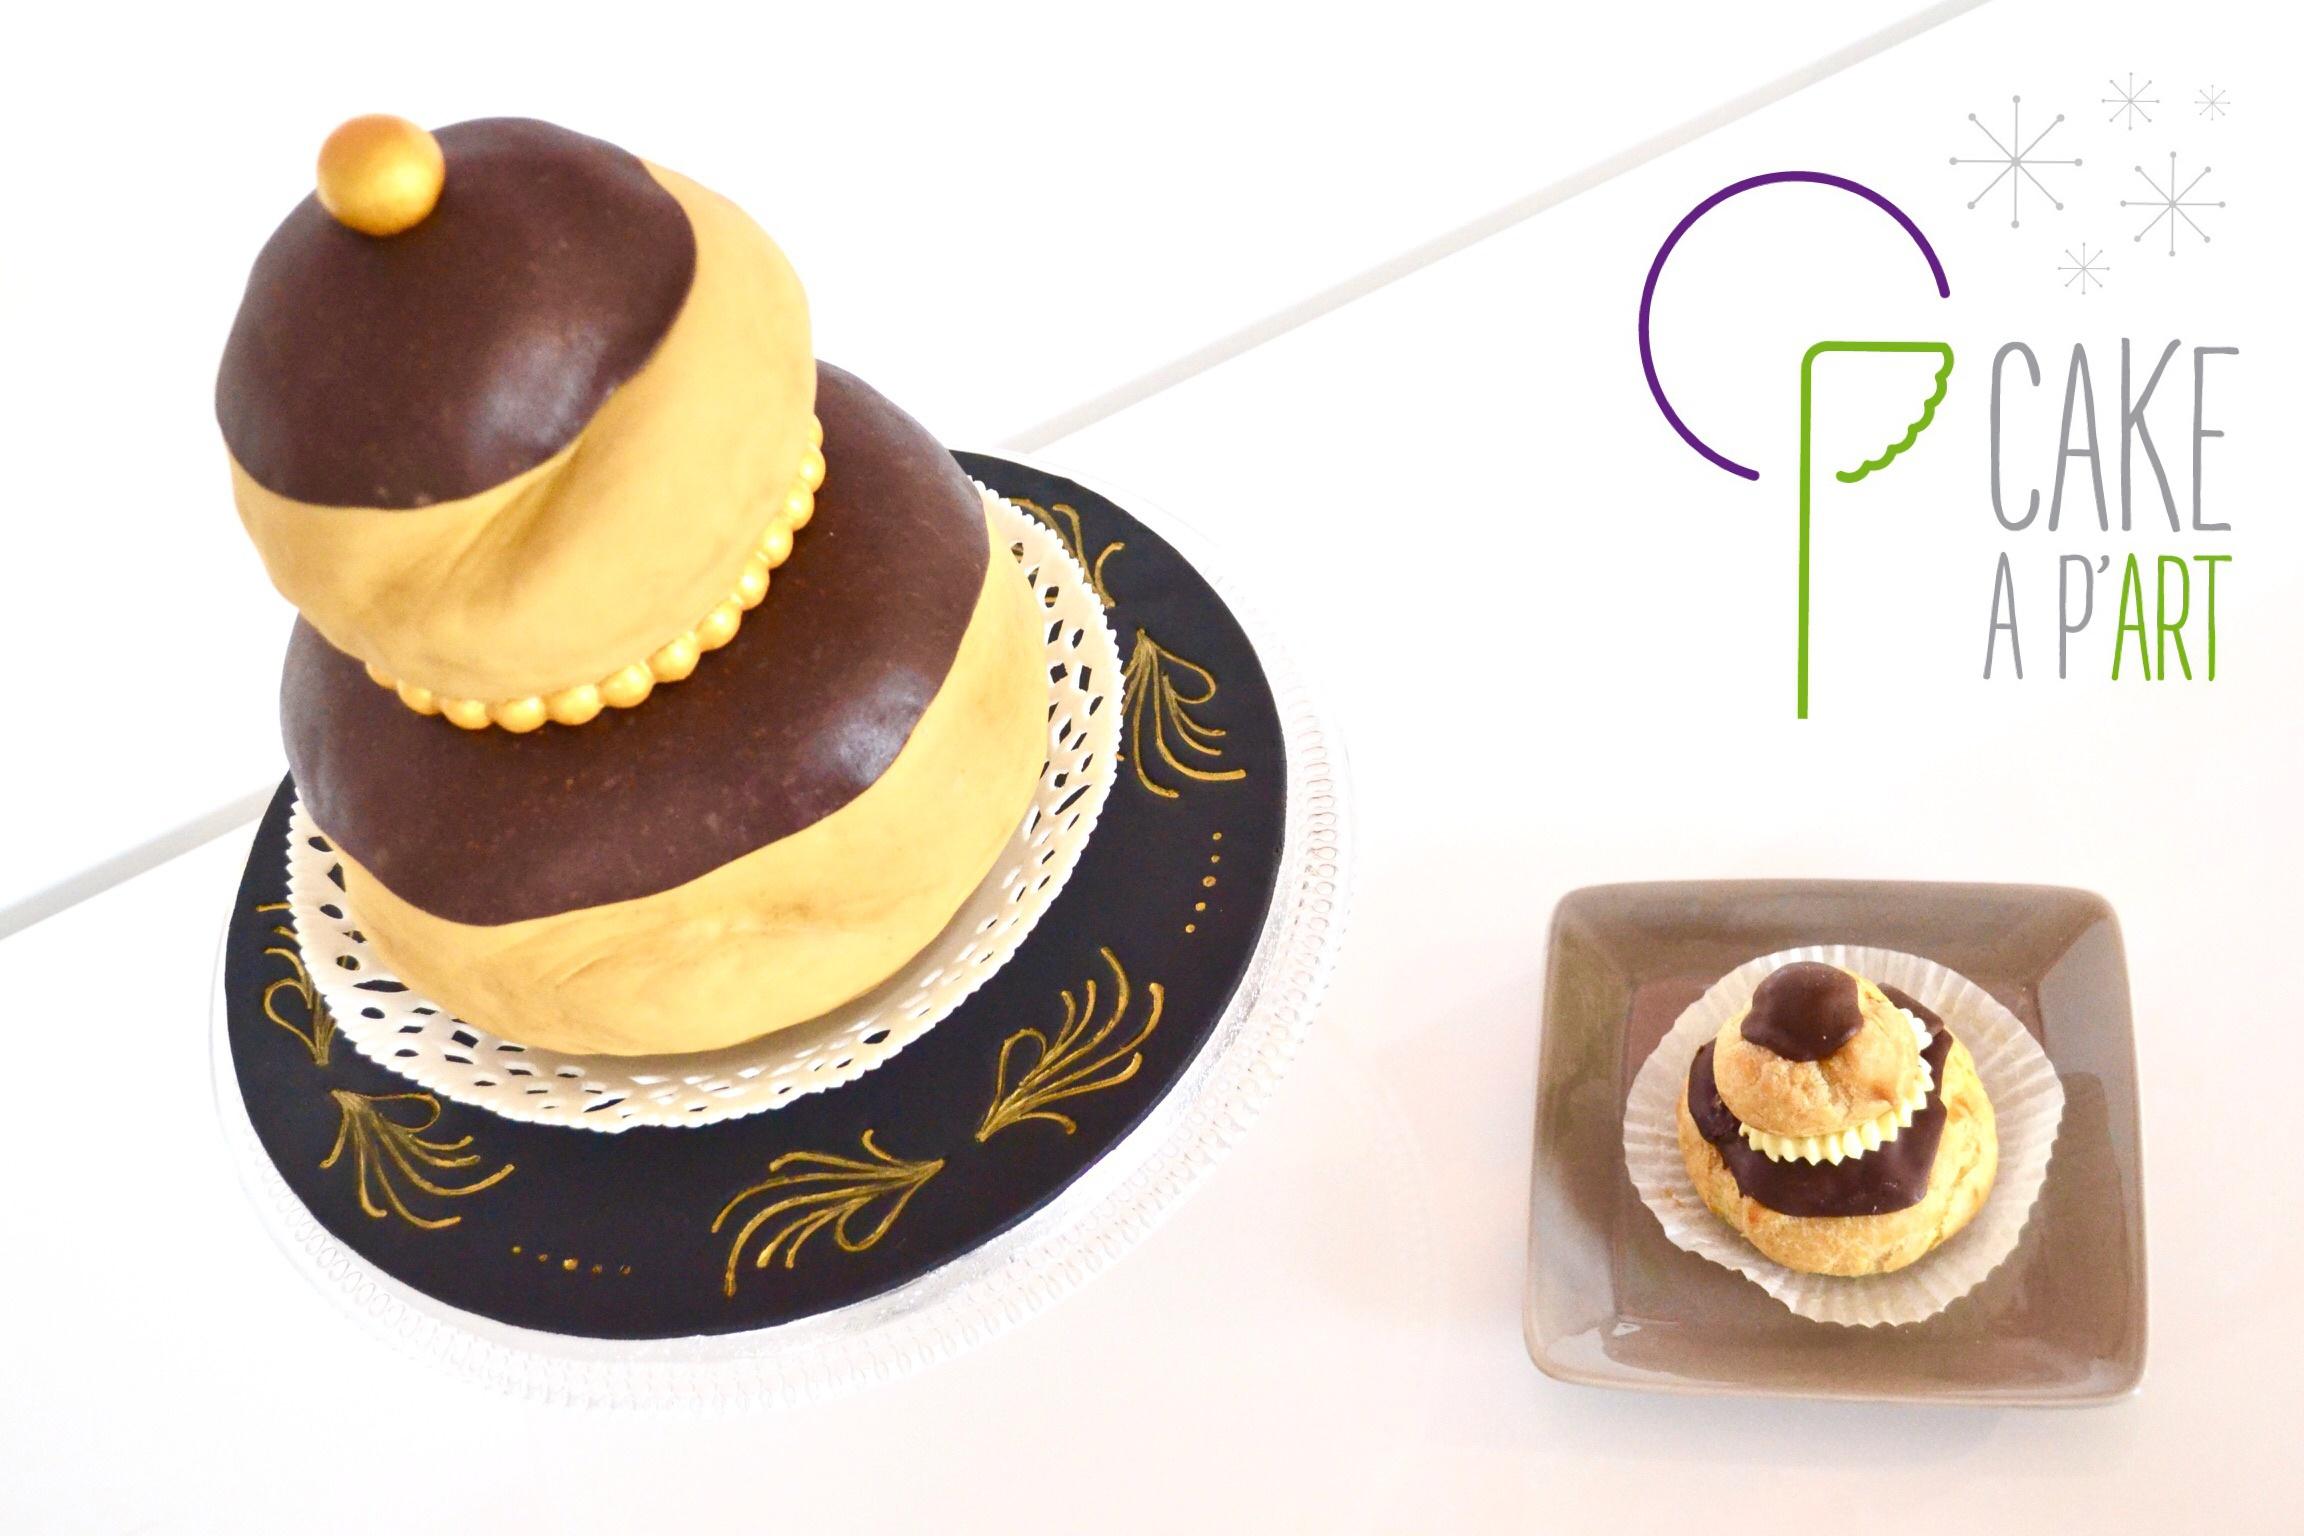 Gâteau sculpté 3D - Cakeapart